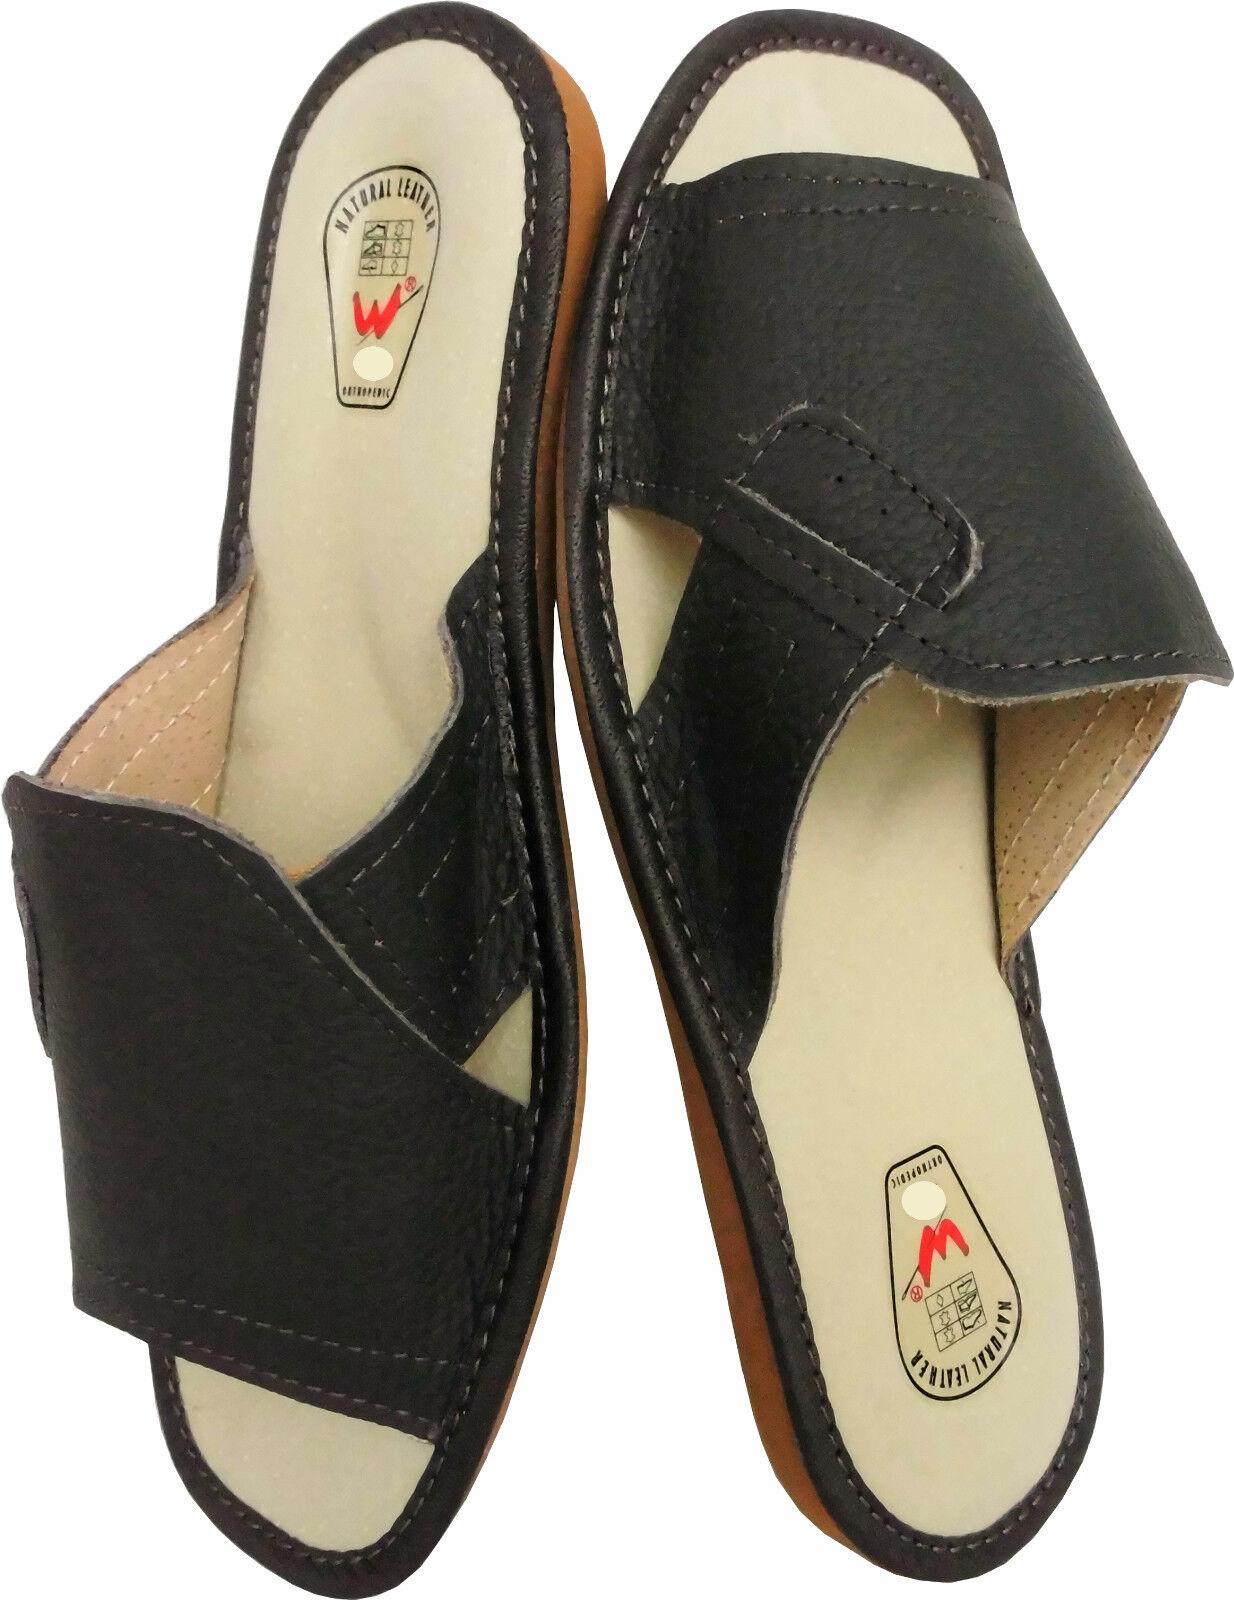 Hausschuhe - Pantolette   Gr.44 *Echt LEDER*   Bequeme (Made in Poland 27-1-3-11) 6caf1e